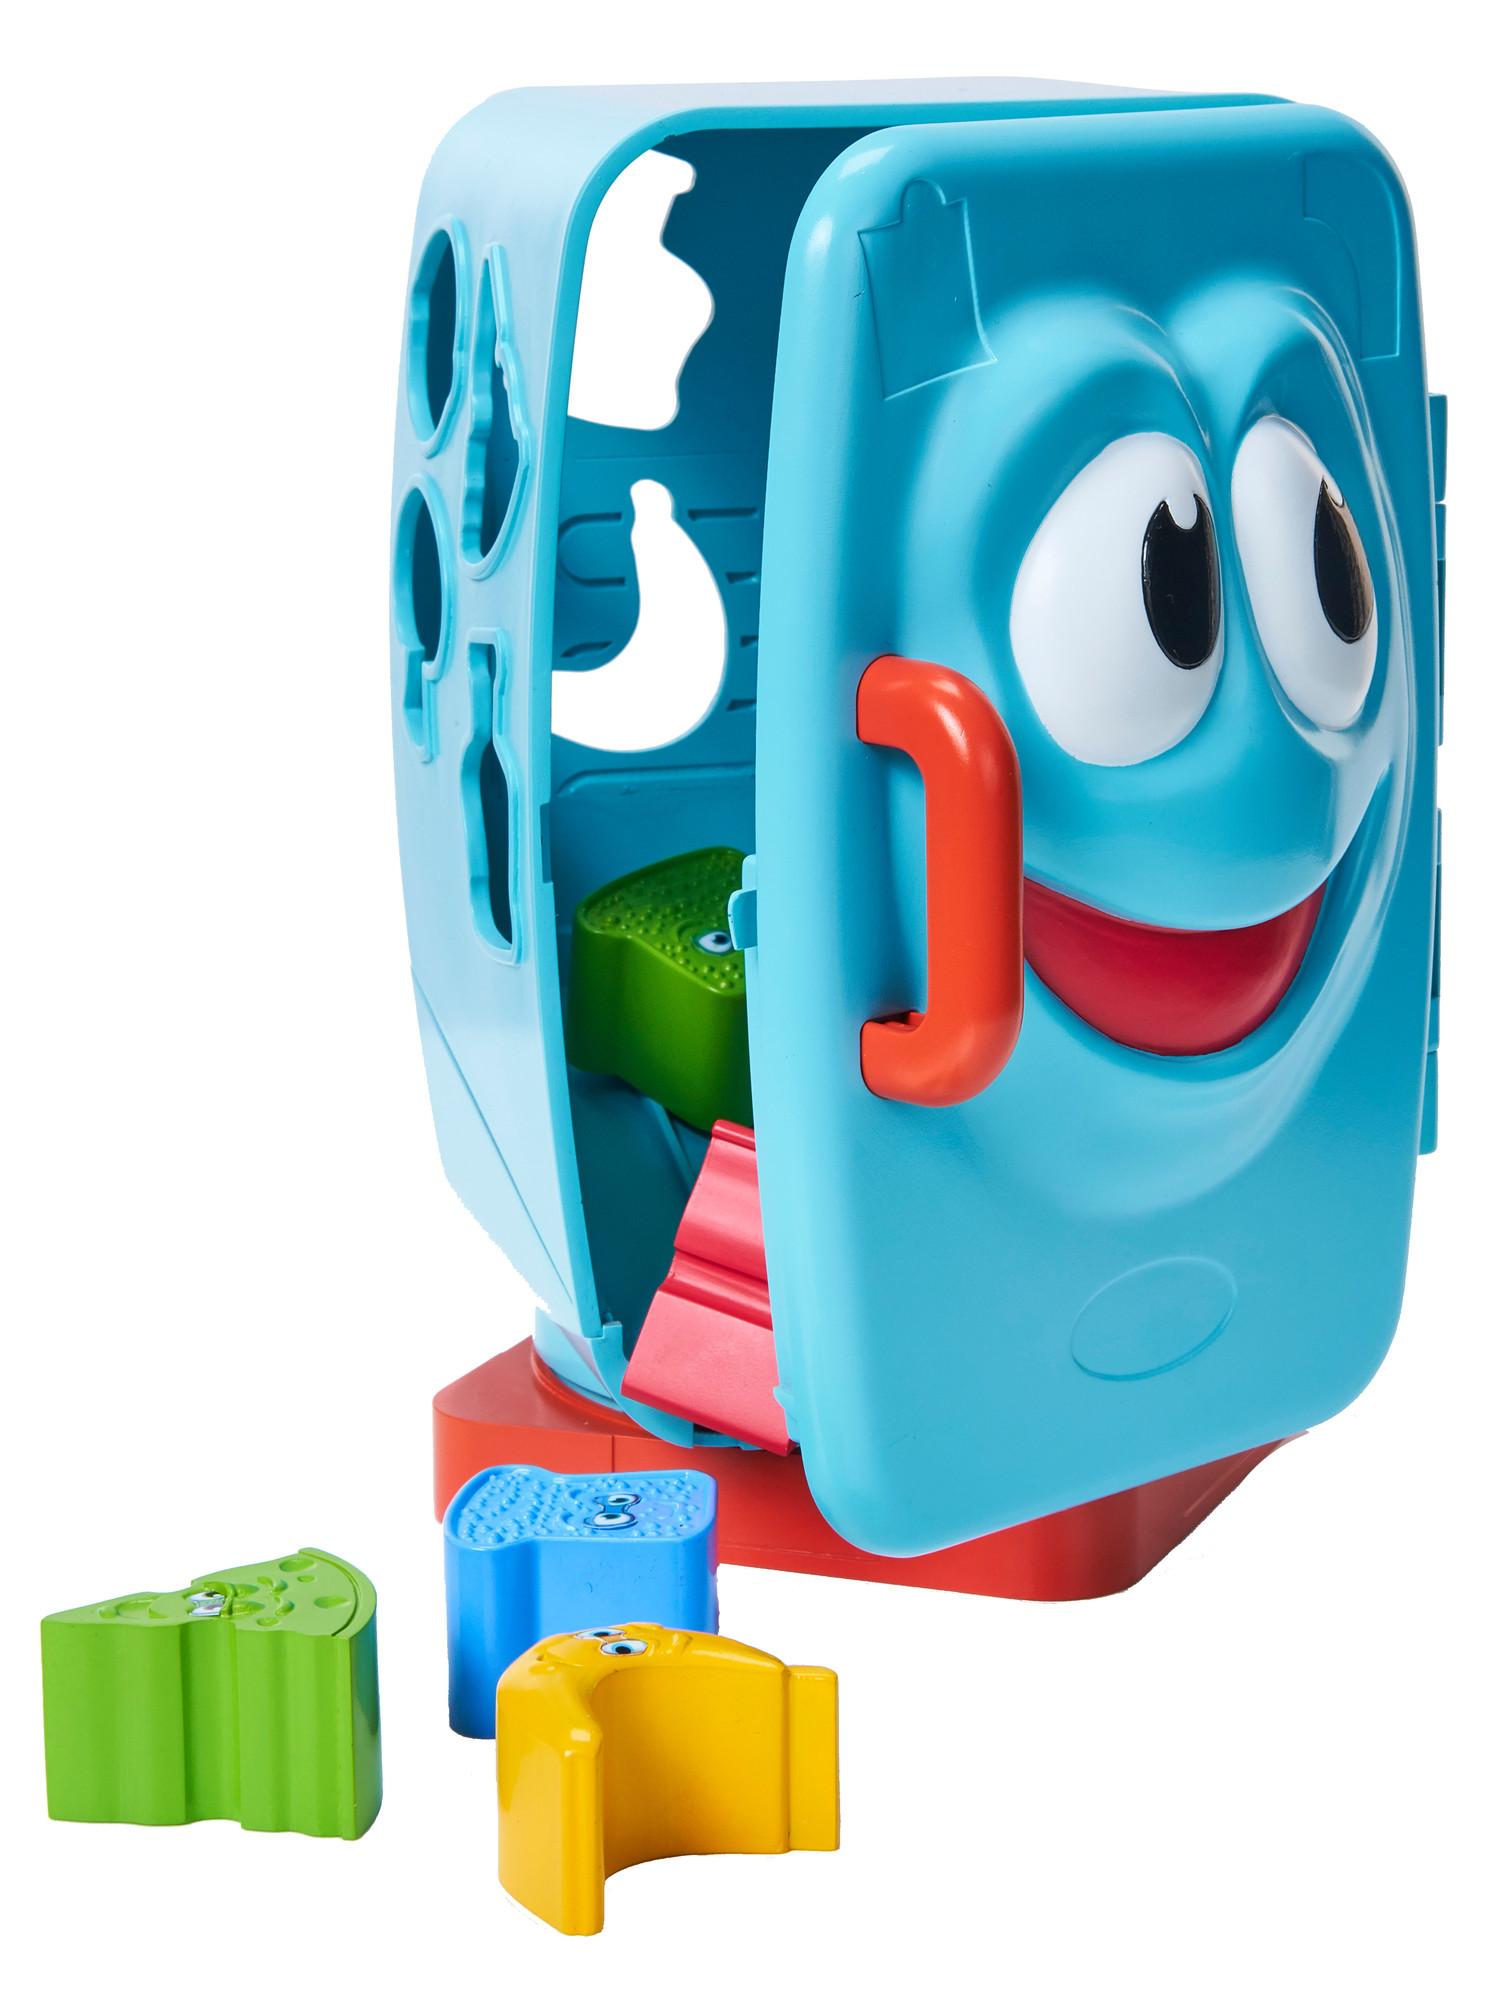 Ausgezeichnet Kühlschrank Spielzeug Ideen - Heimat Ideen - otdohnem.info